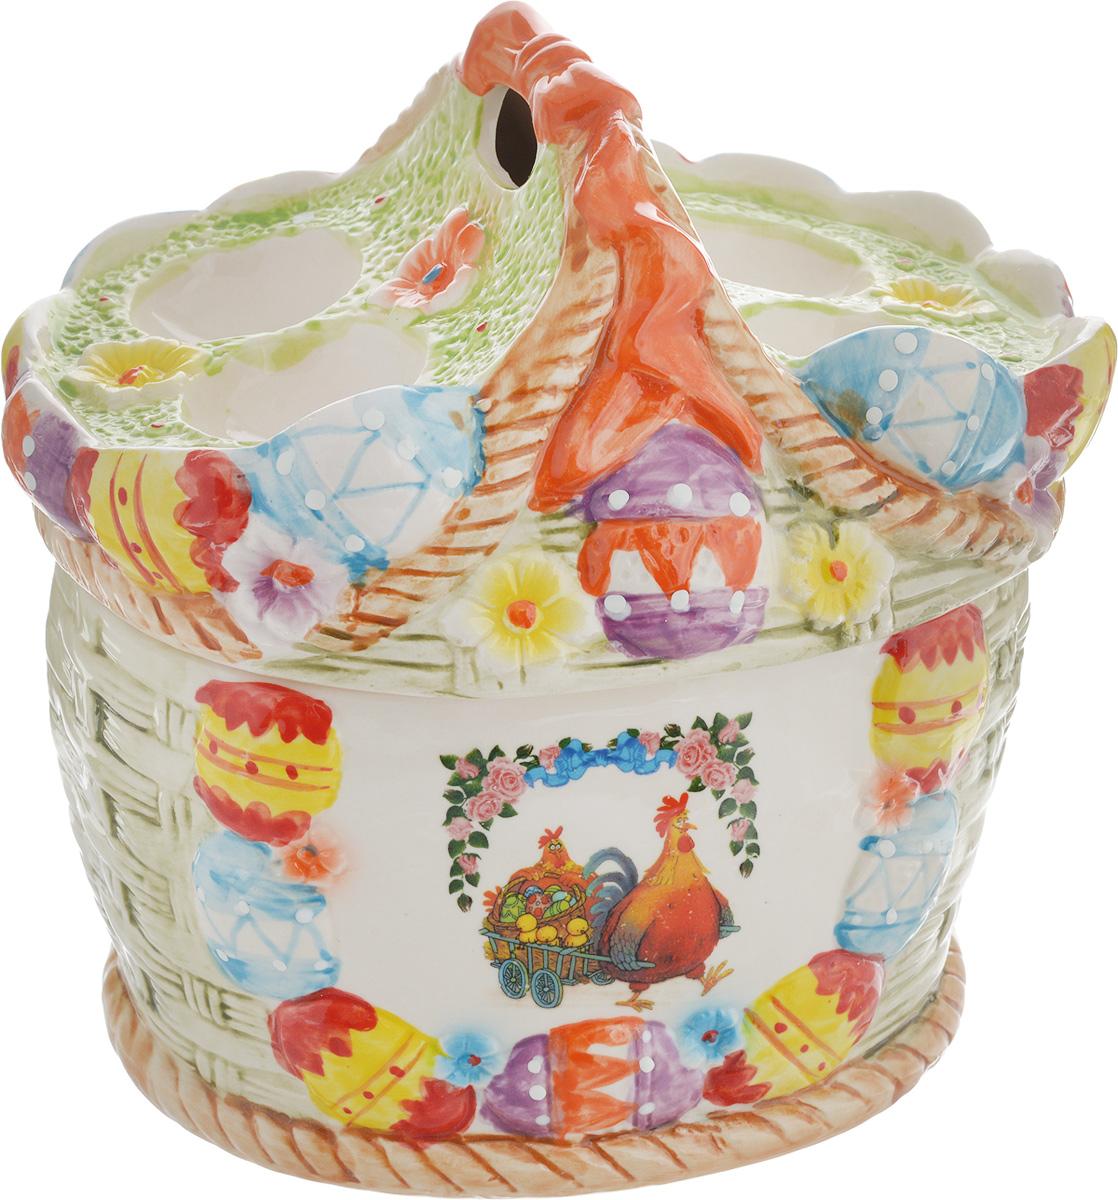 Вазочка Win Max, для пасхальных яиц и угощений, 20 х 22 х 18 см14025